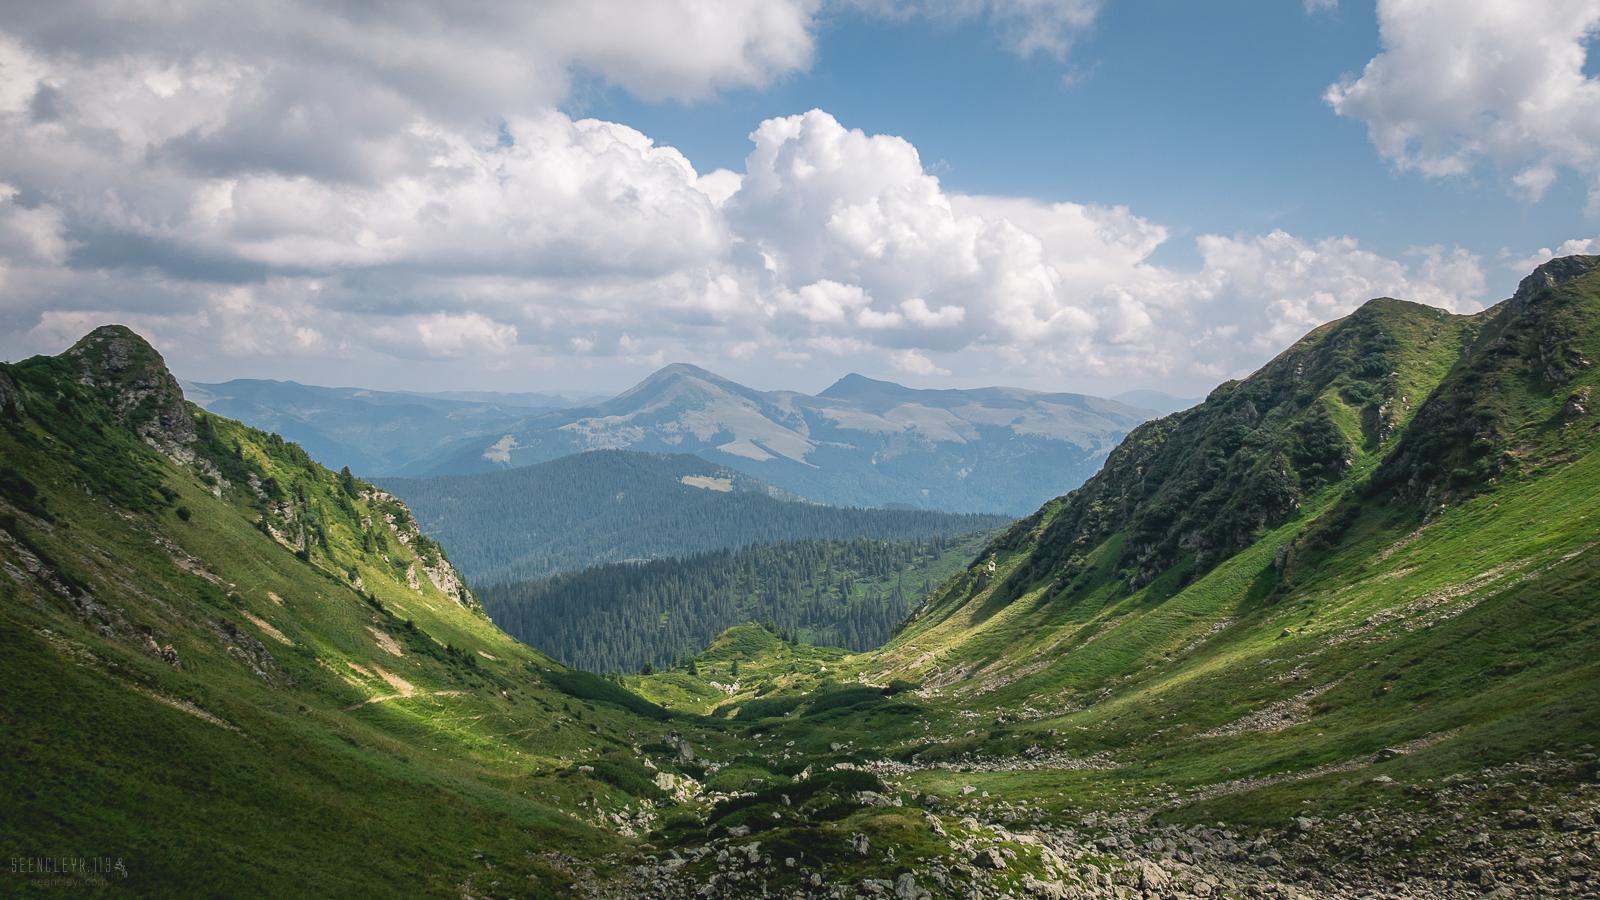 красивый природа фото фотоальбом пейзаж карпати гора фотографія landscape carpathians мармароси мармаросы фото-вилазка літо лето